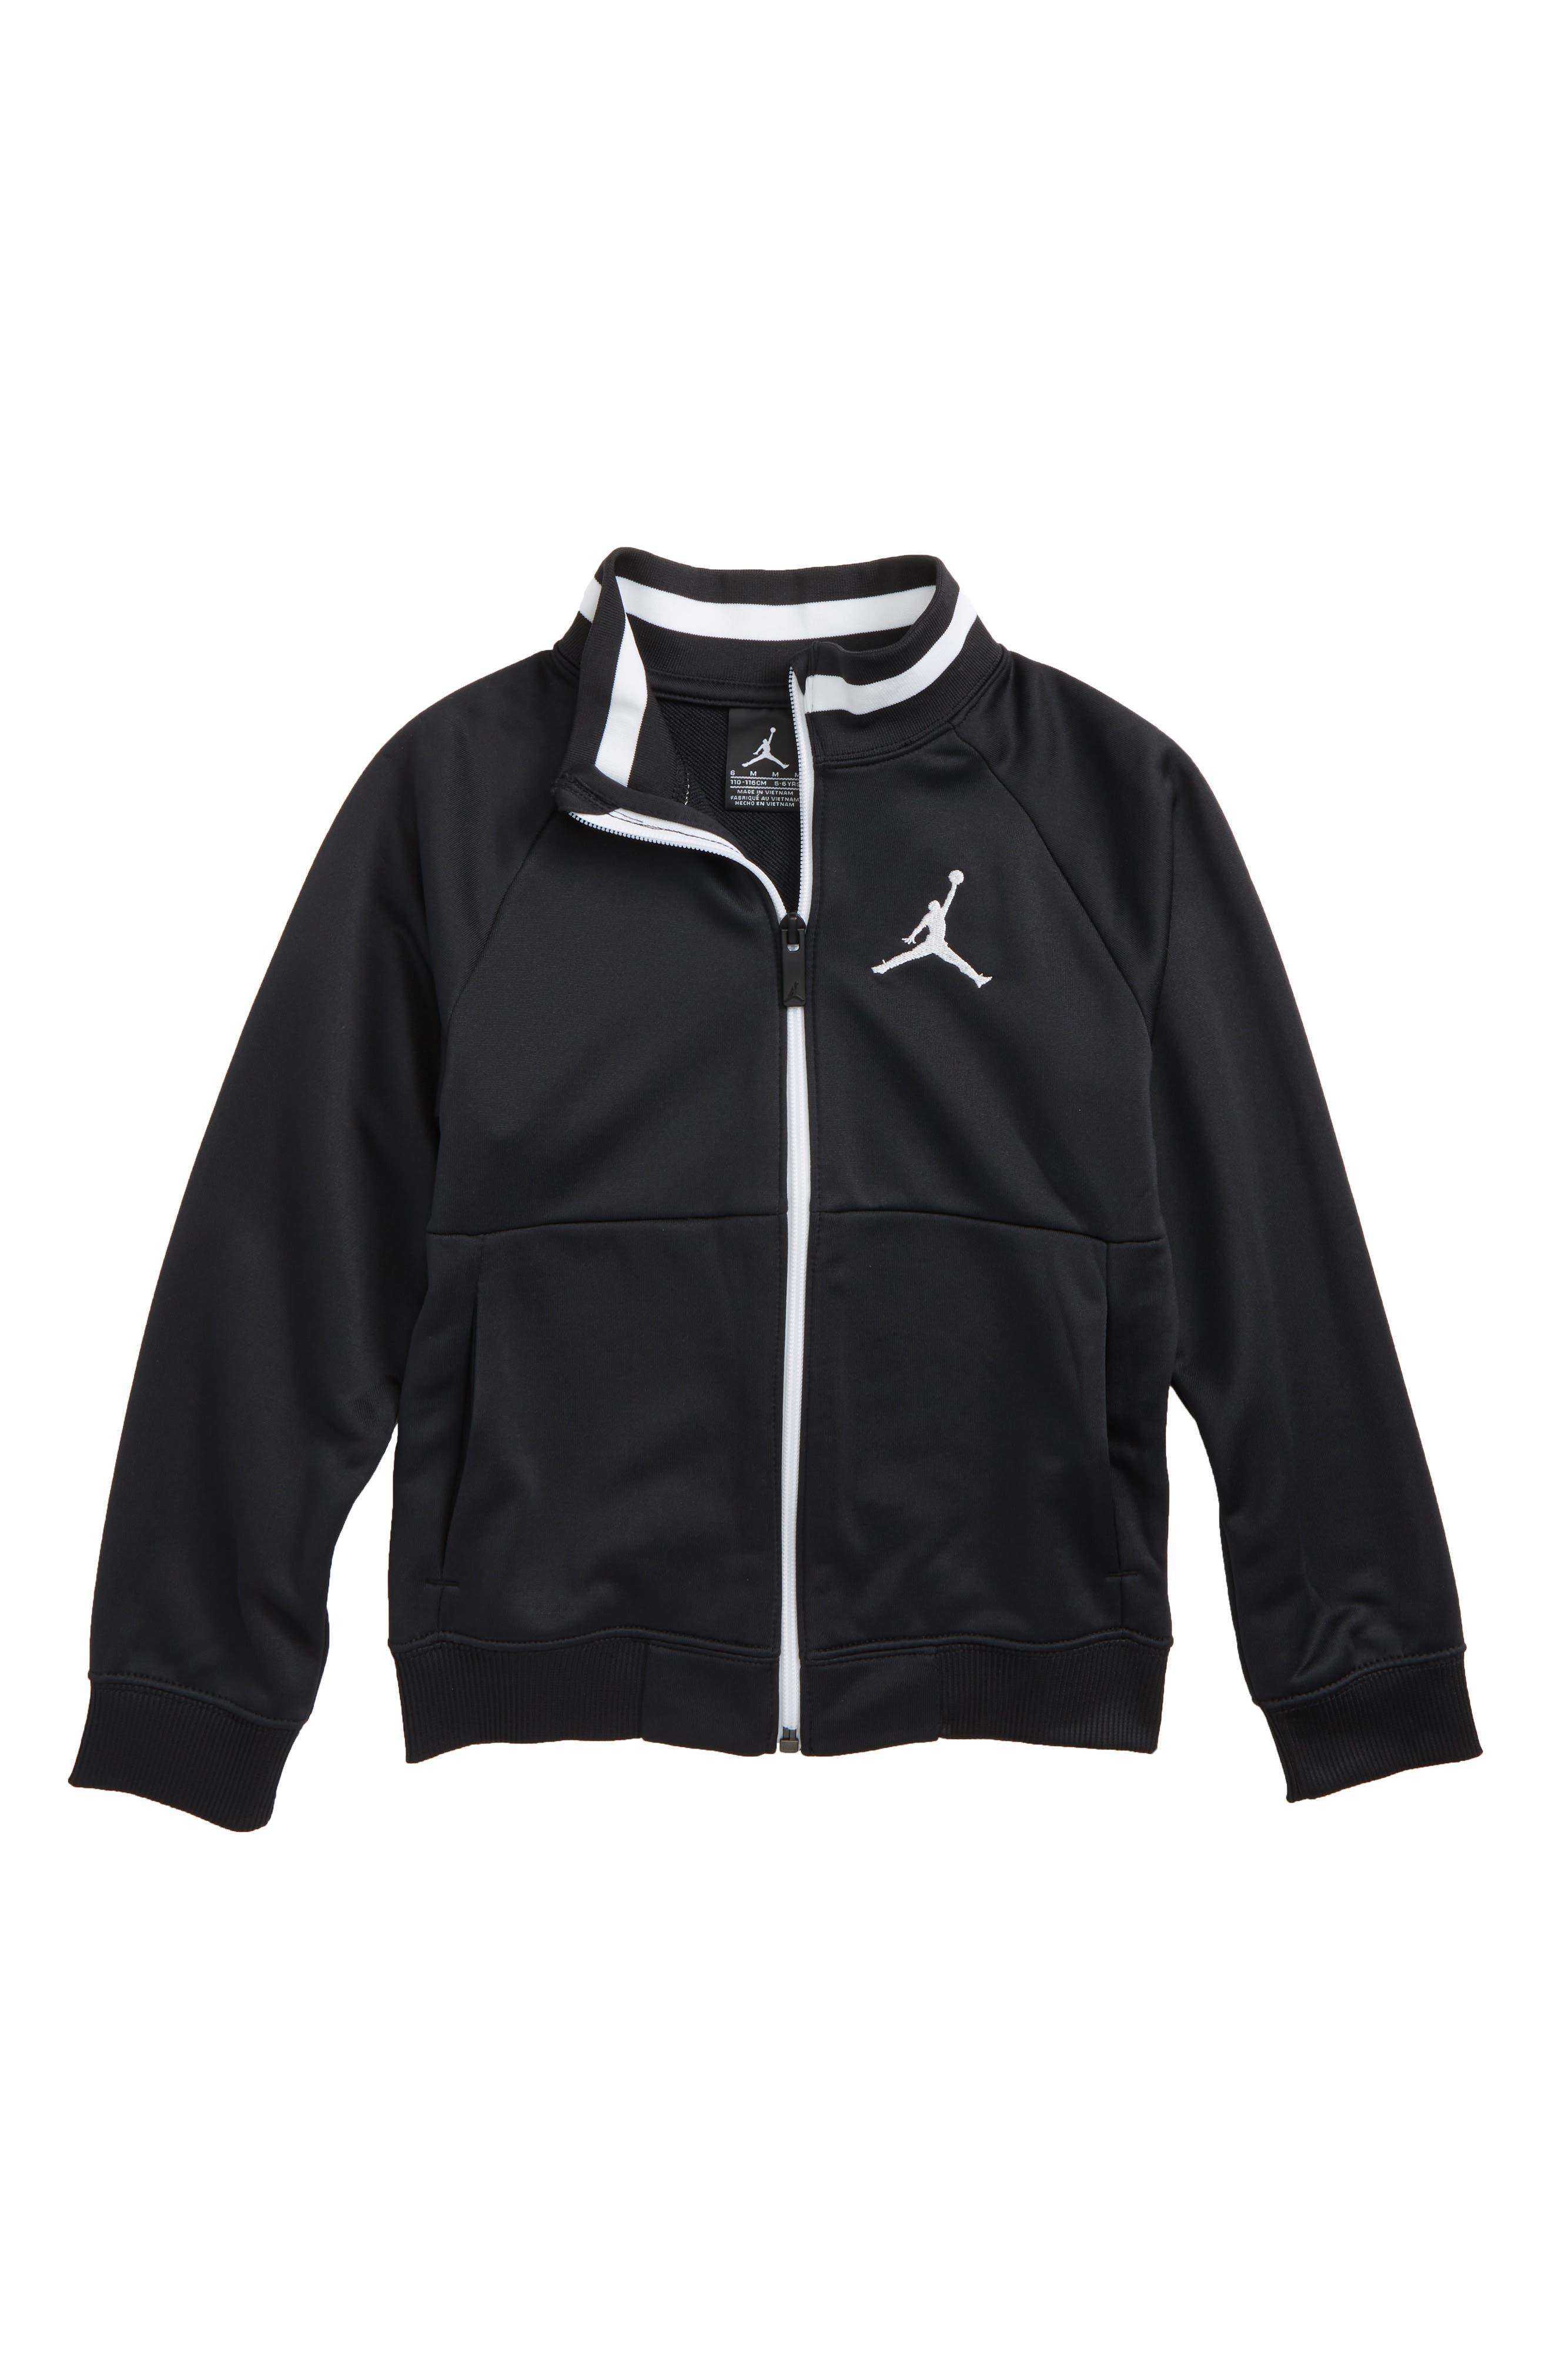 Jordan '90s Tricot Jacket,                         Main,                         color, Black